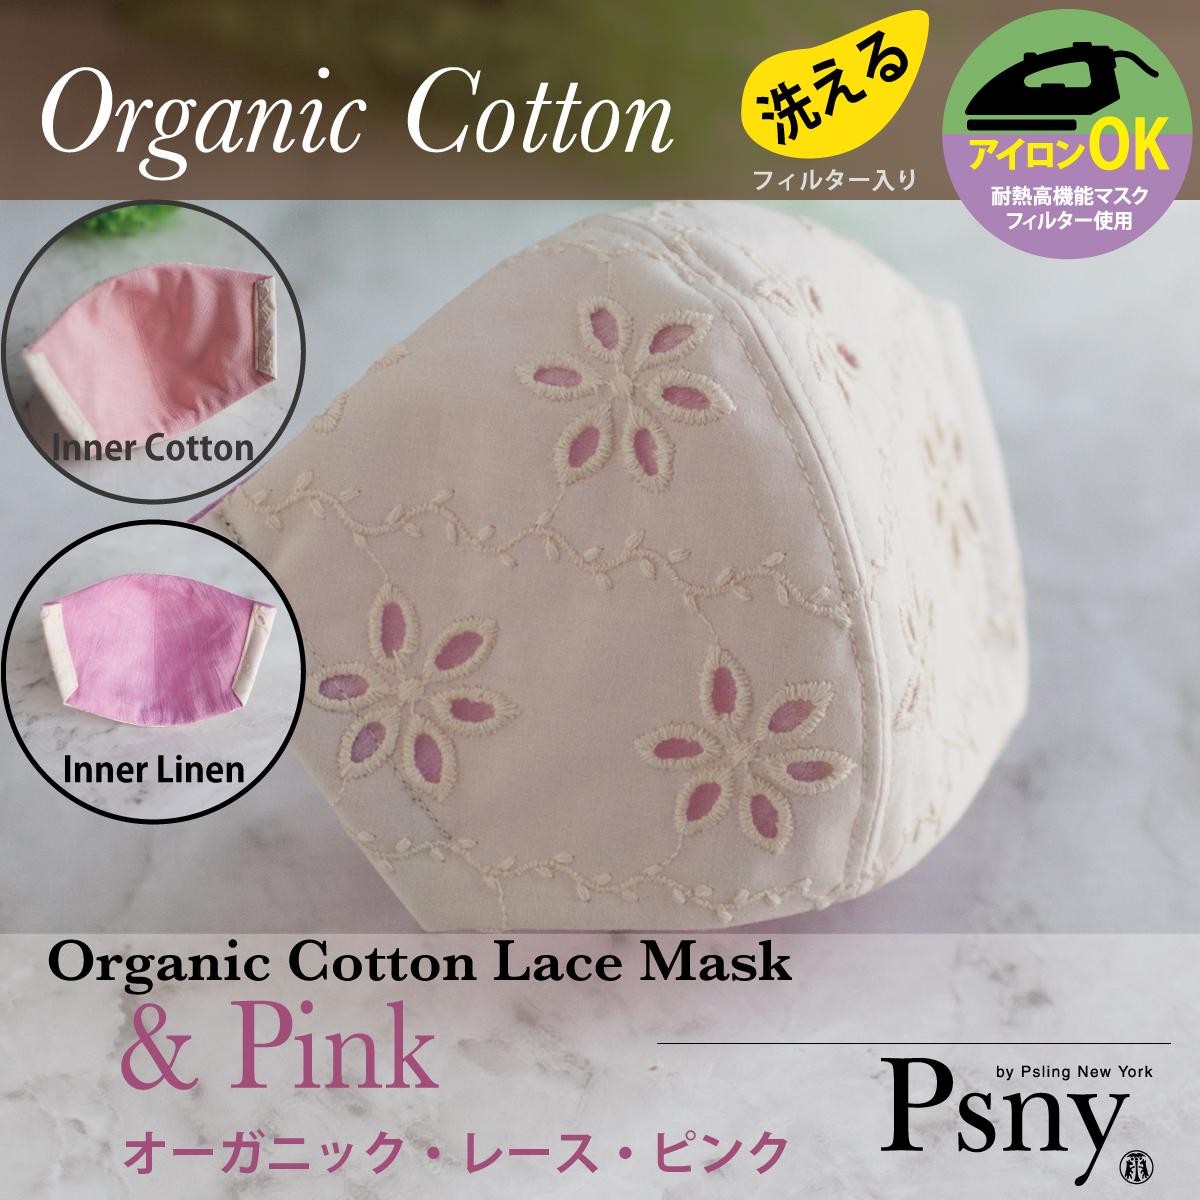 PSNY オーガニックコットン・レース(ピンク) 花粉 黄砂 洗えるフィルター入り 立体 マスク 大人用 送料無料